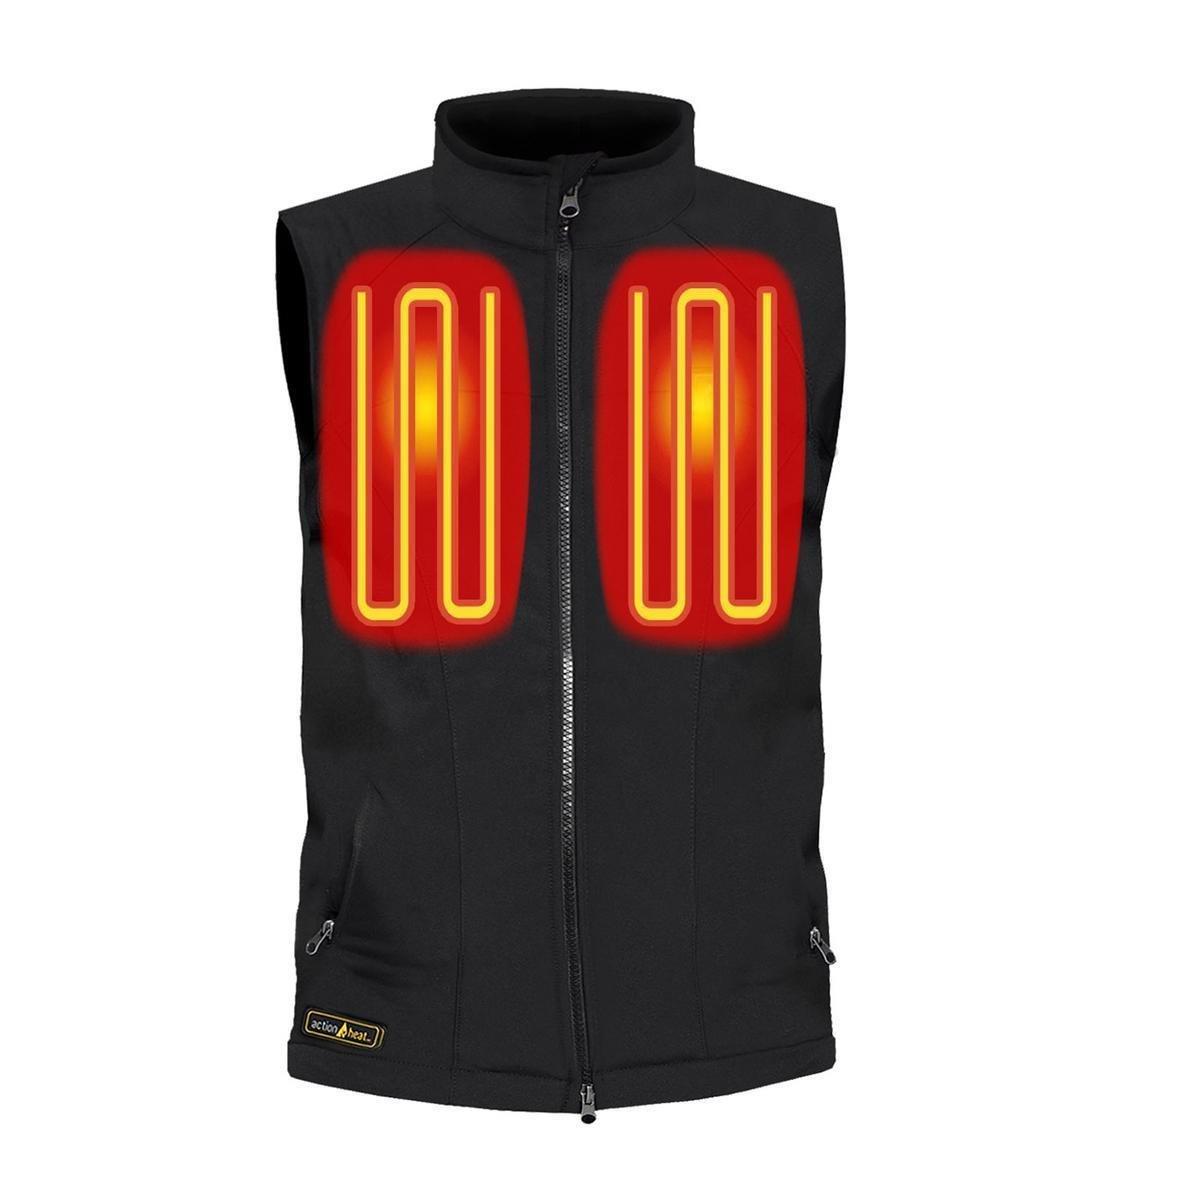 ActionHeat 5V Battery Heated Softshell Vest - Men's JustBrand Limited